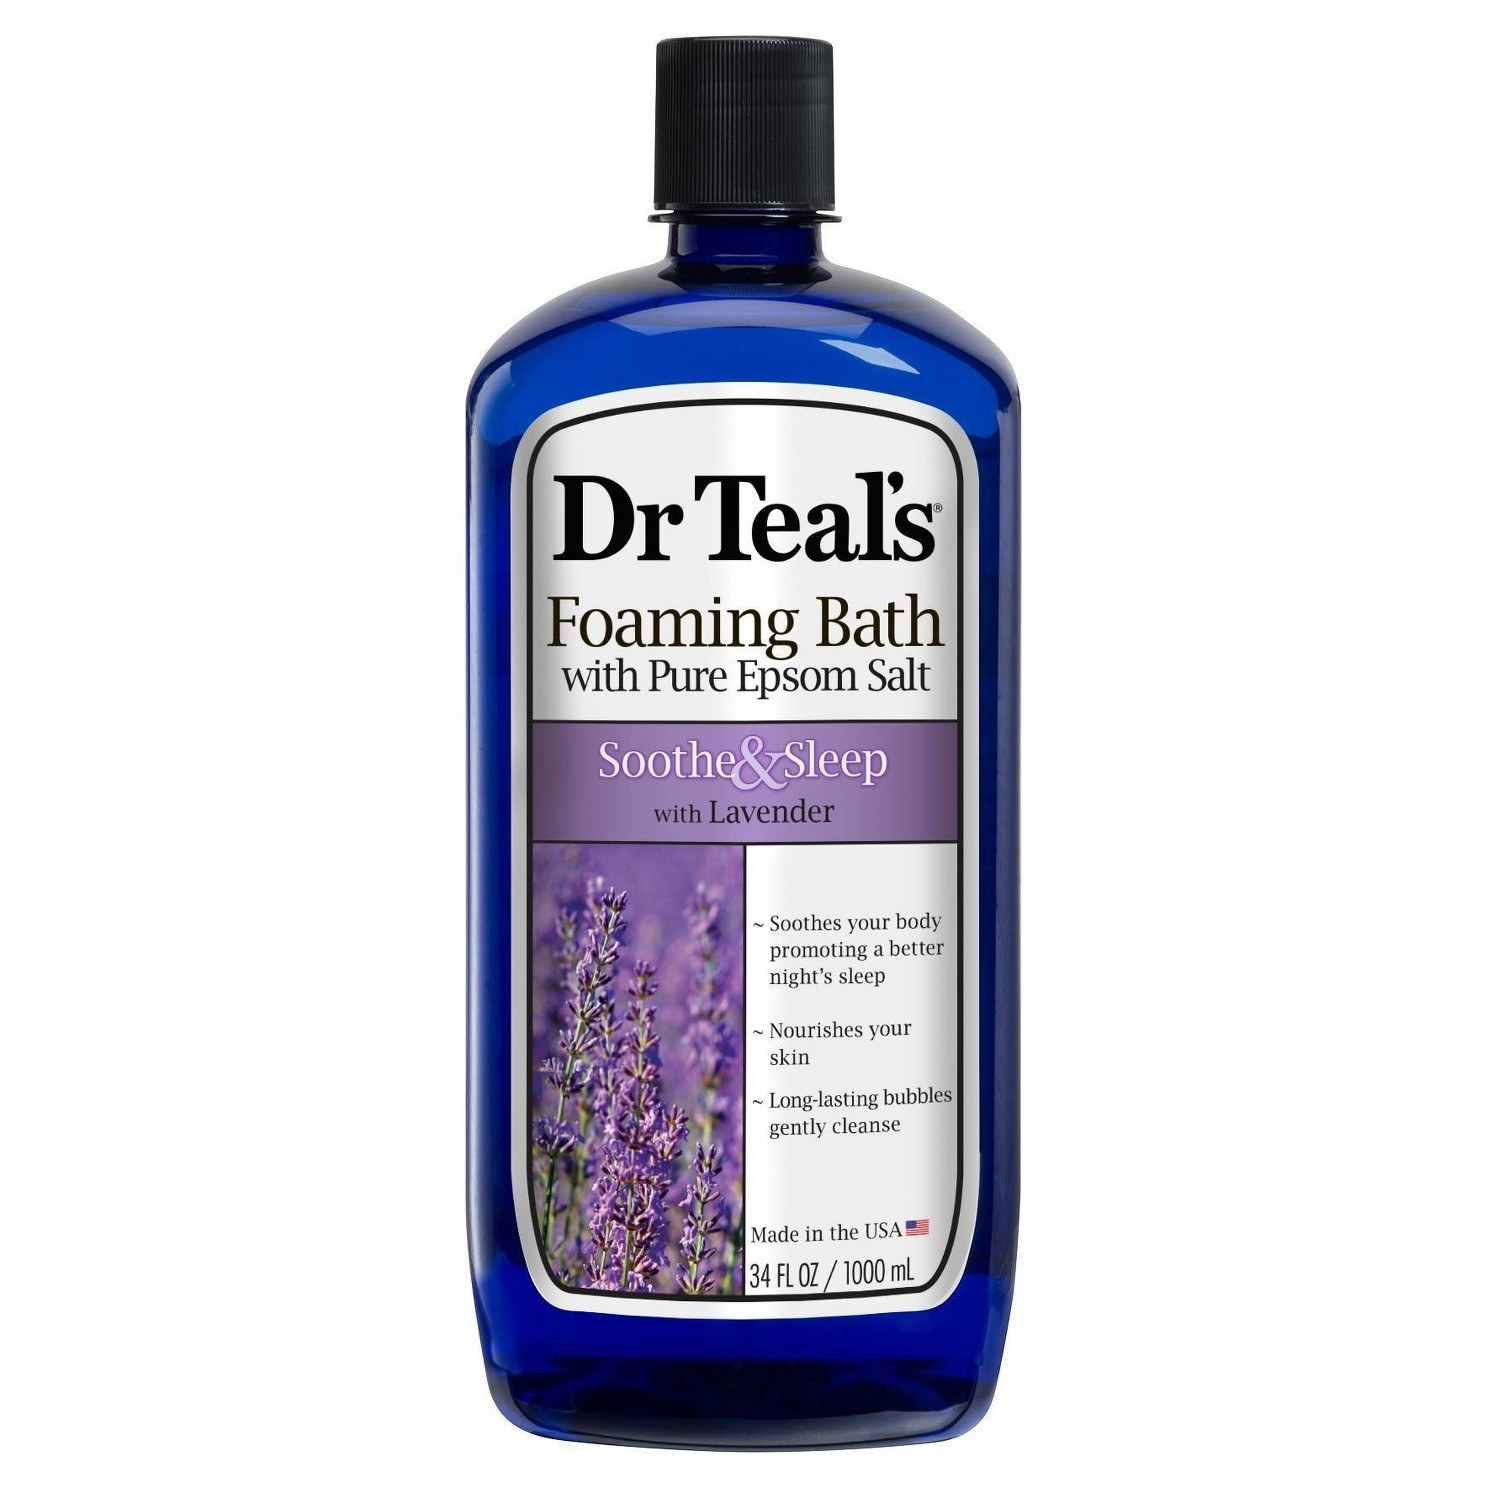 The bottle of lavender bath soak